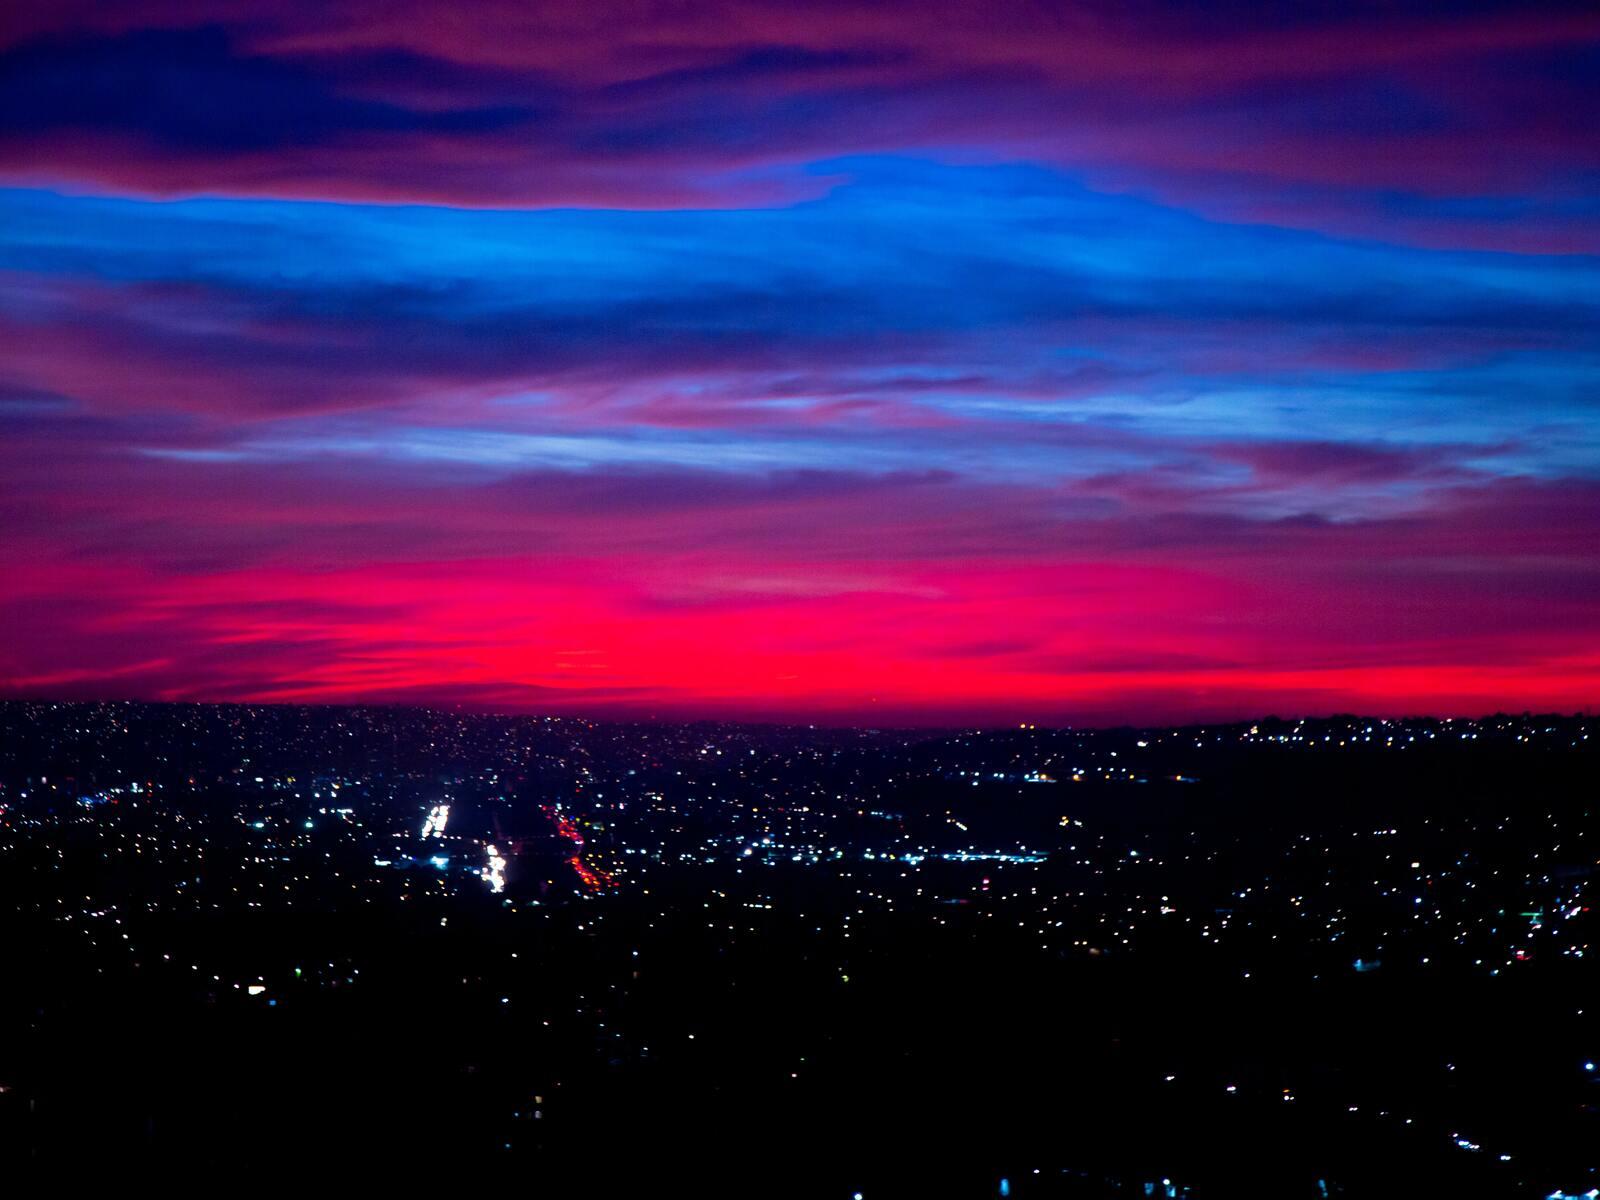 city-red-5k-1o.jpg